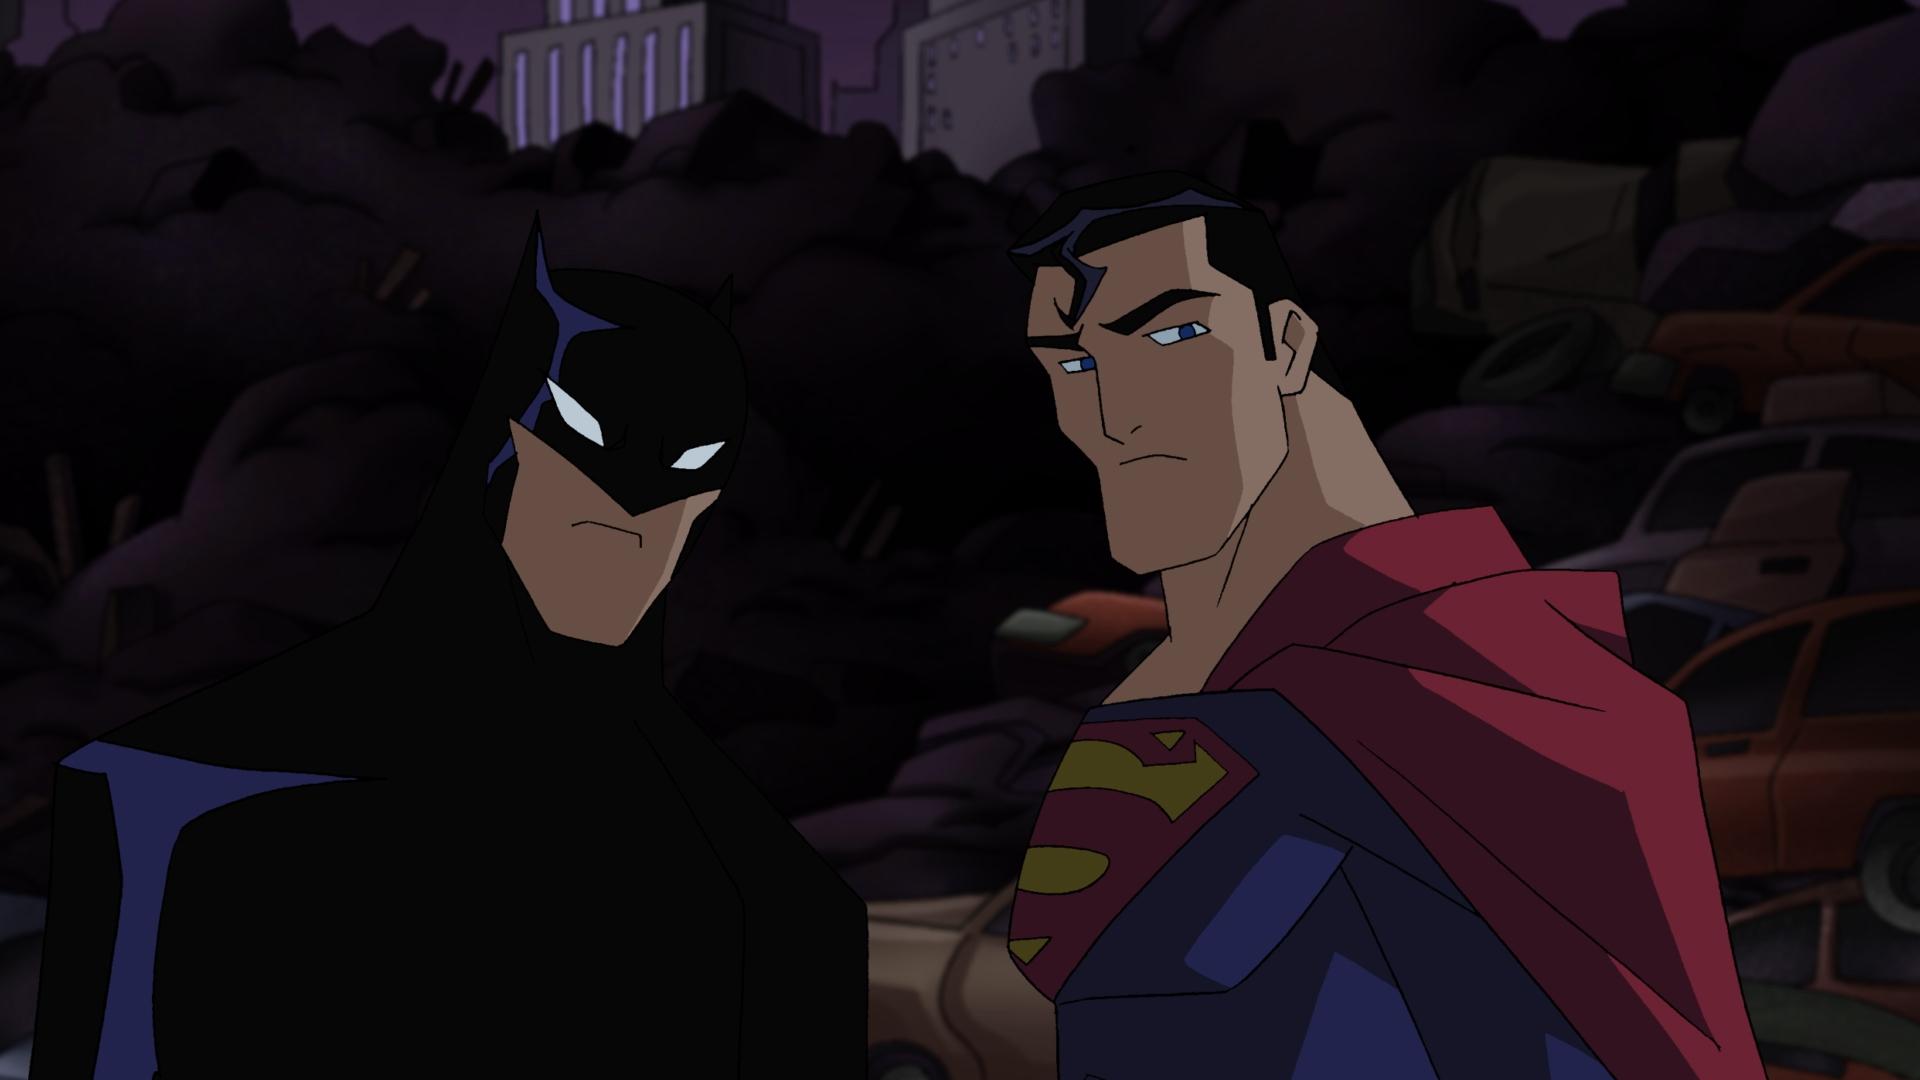 The Batman Episode 5.01: The Batman/Superman Story Pt. 1 | Batman Wiki | FANDOM powered by Wikia